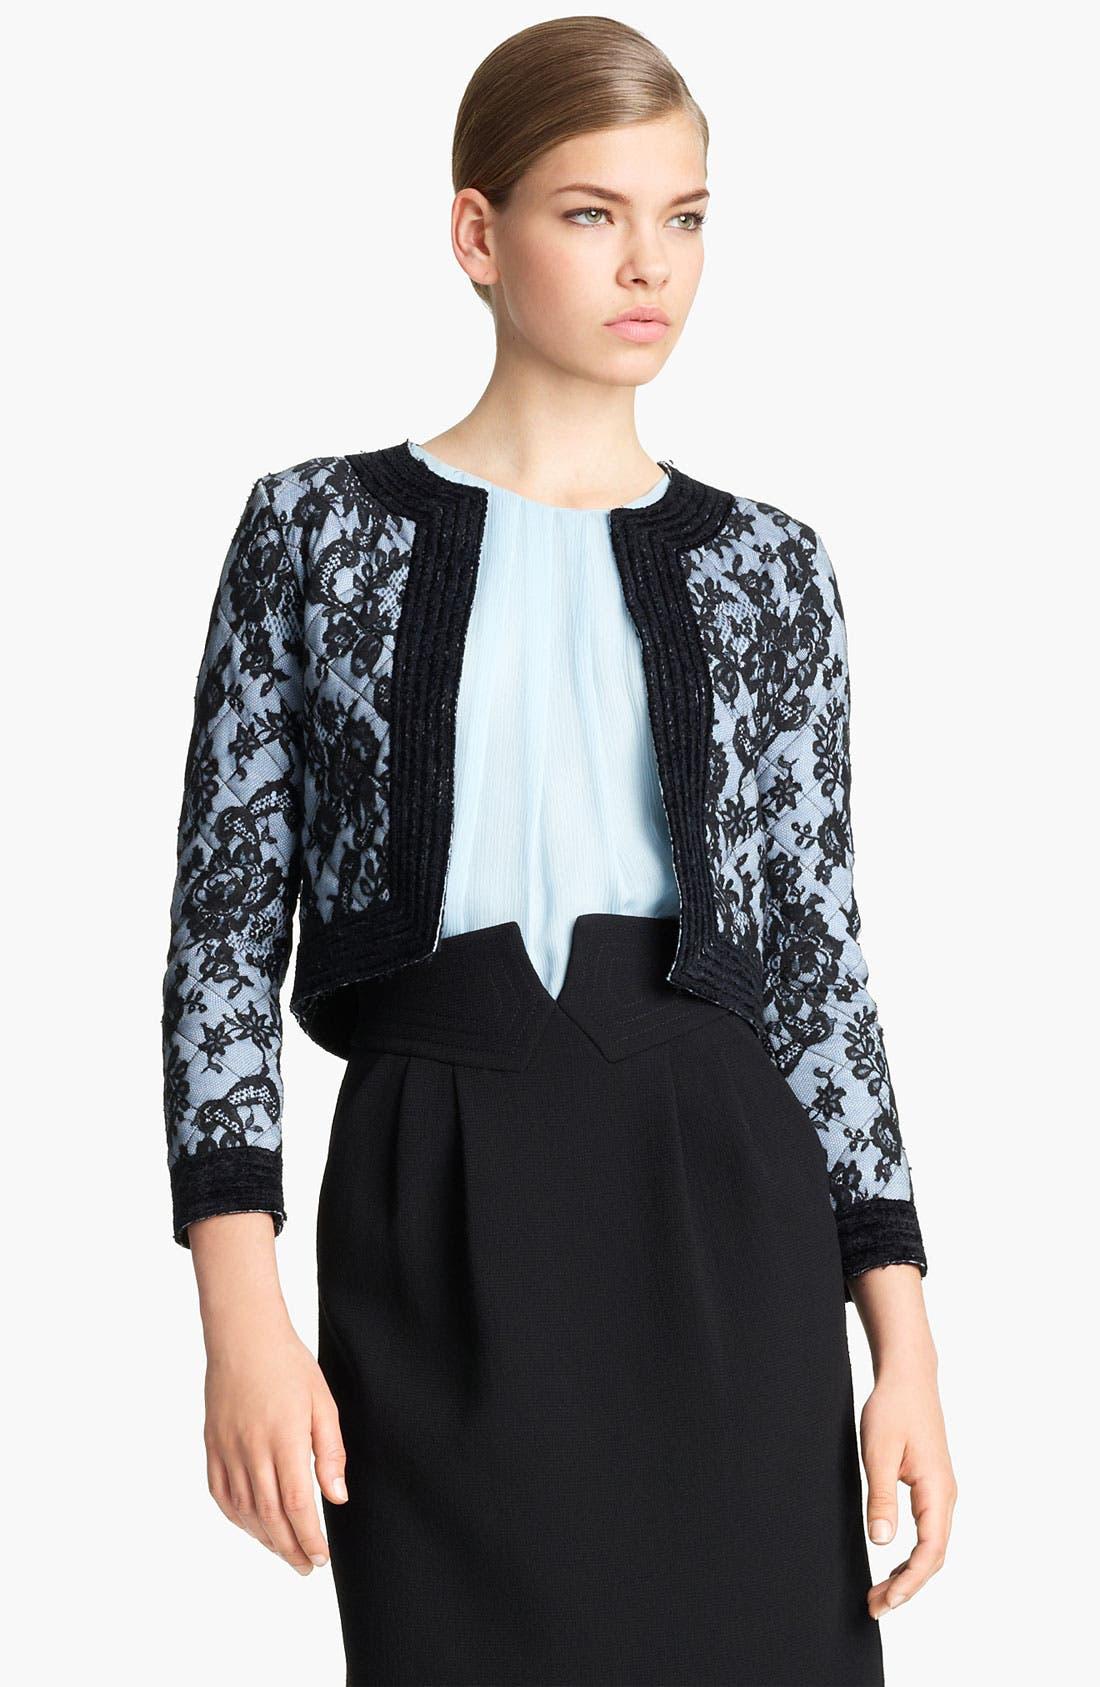 Alternate Image 1 Selected - Oscar de la Renta Quilted Lace Jacket